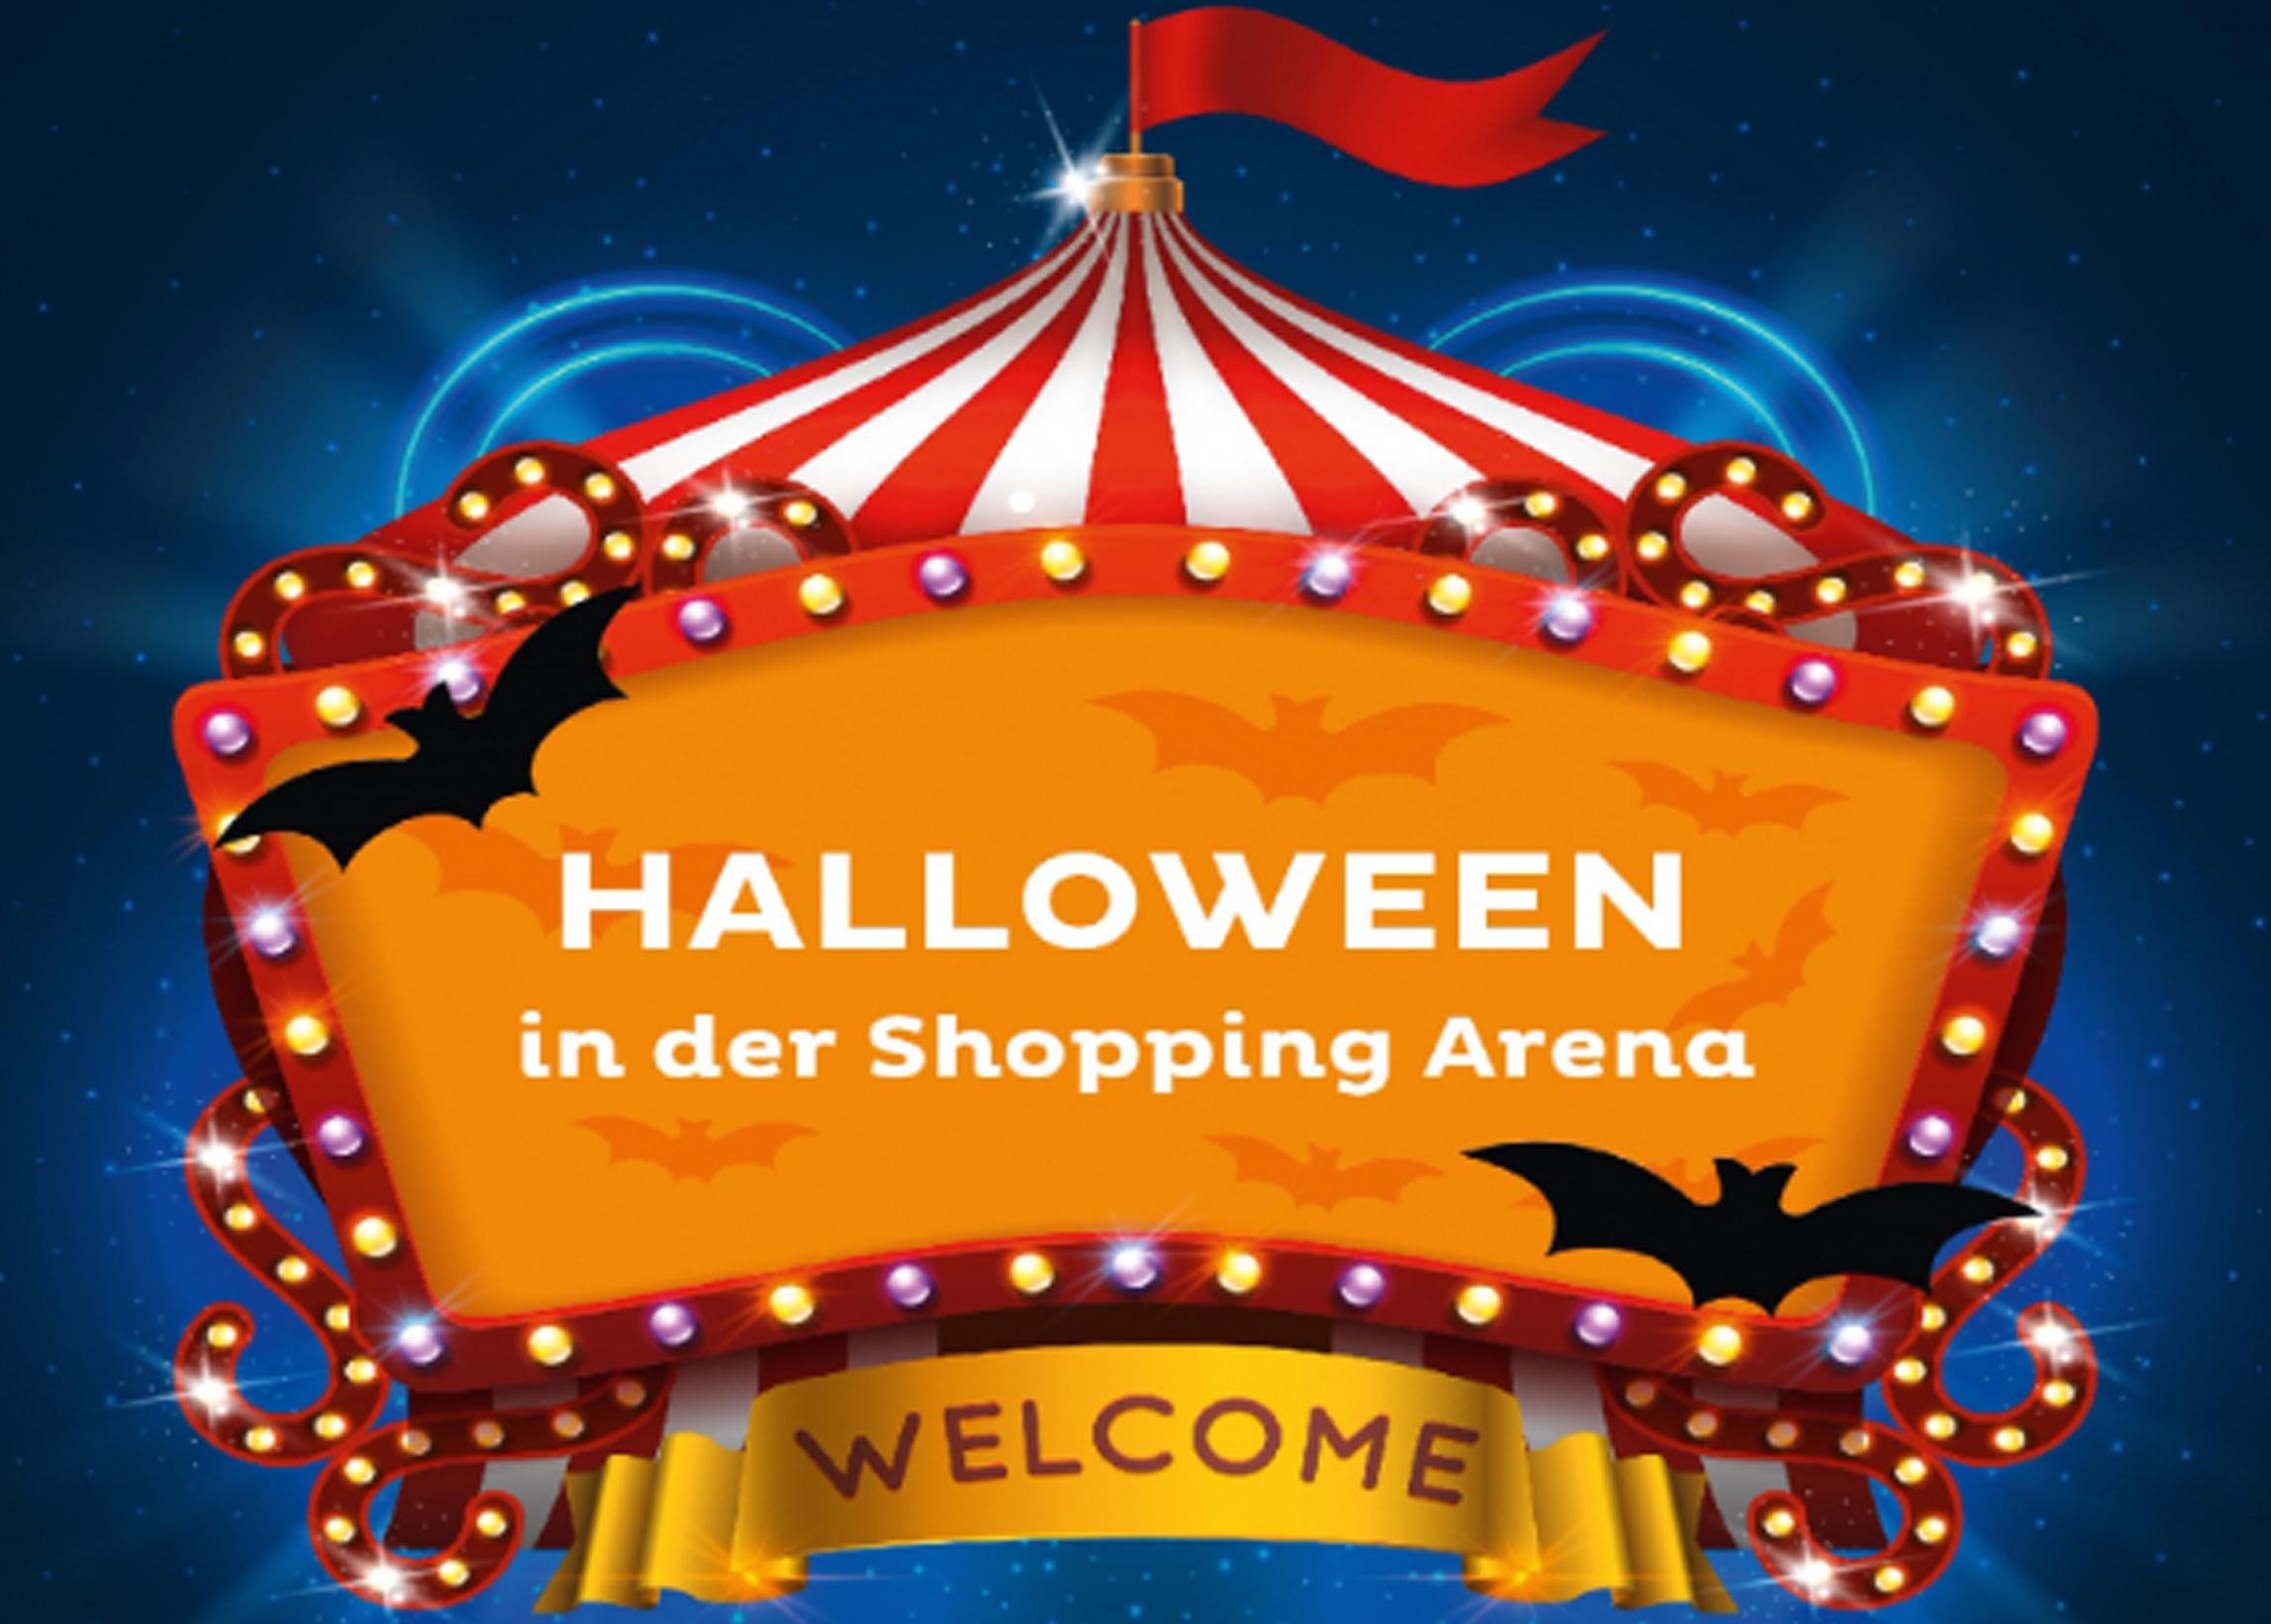 Salzburg-Cityguide - Eventfoto - OK_HALLOWEEN_SA_Events_551x394